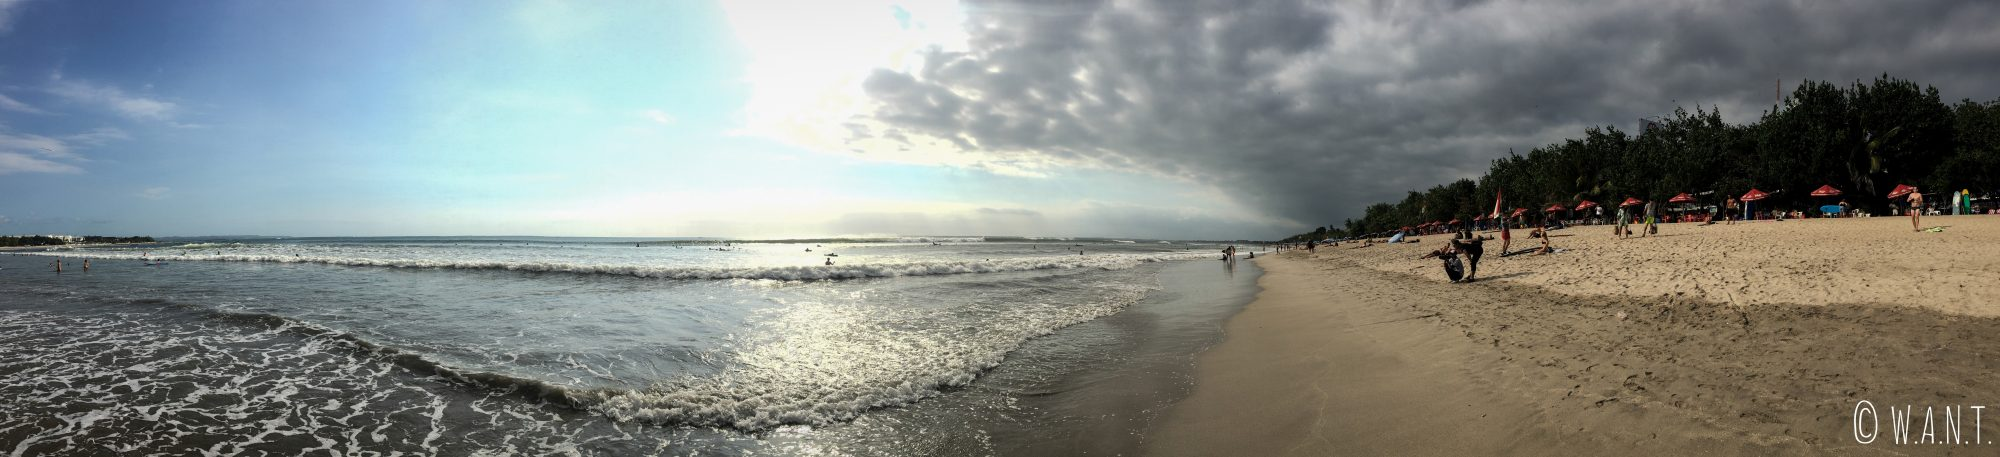 Panorama de la plage de Kuta à Bali